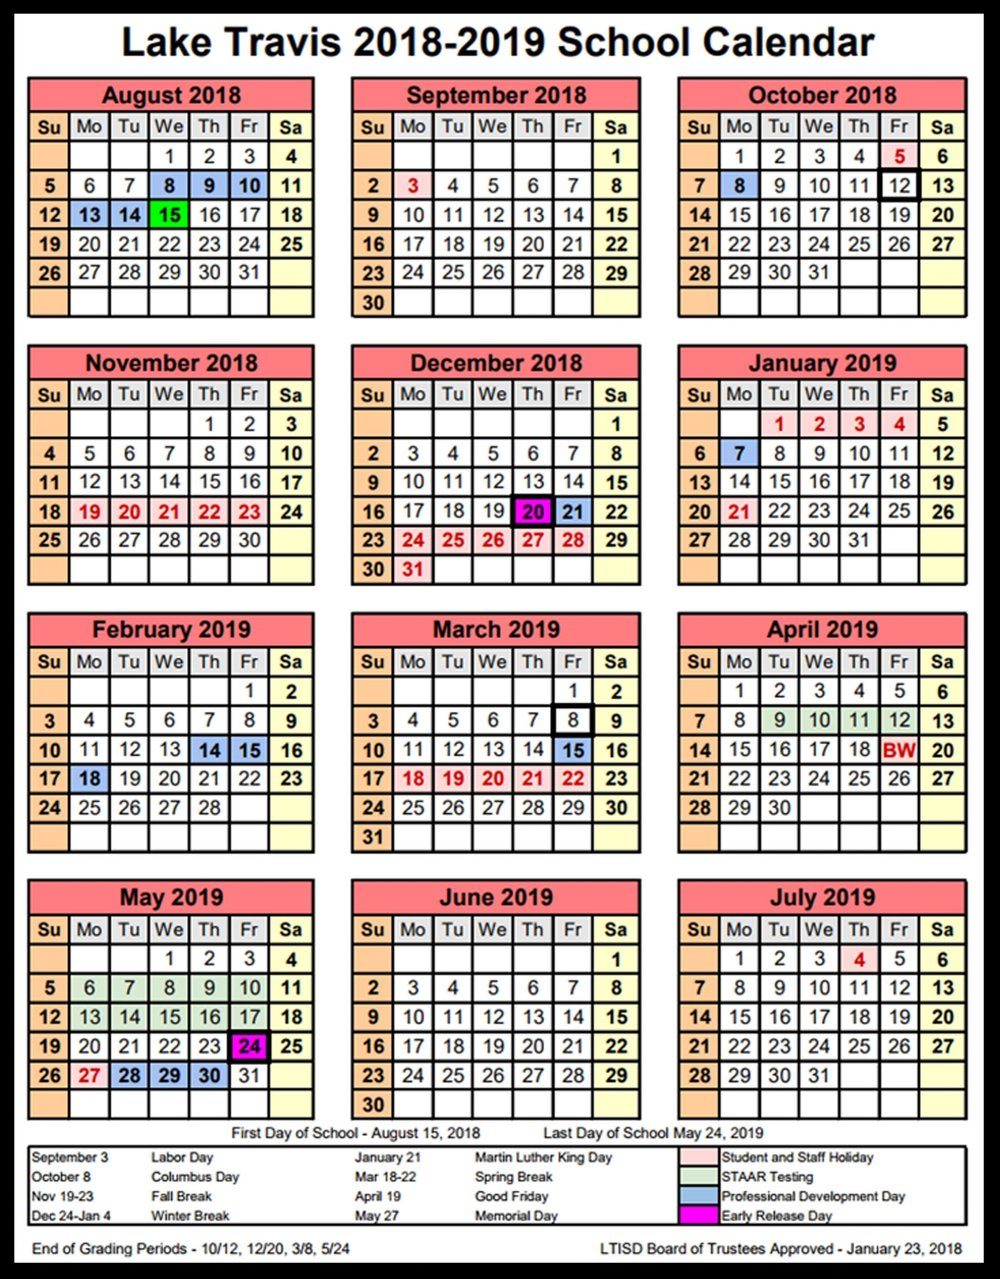 LTISD 2018-2019 Calendar.jpg